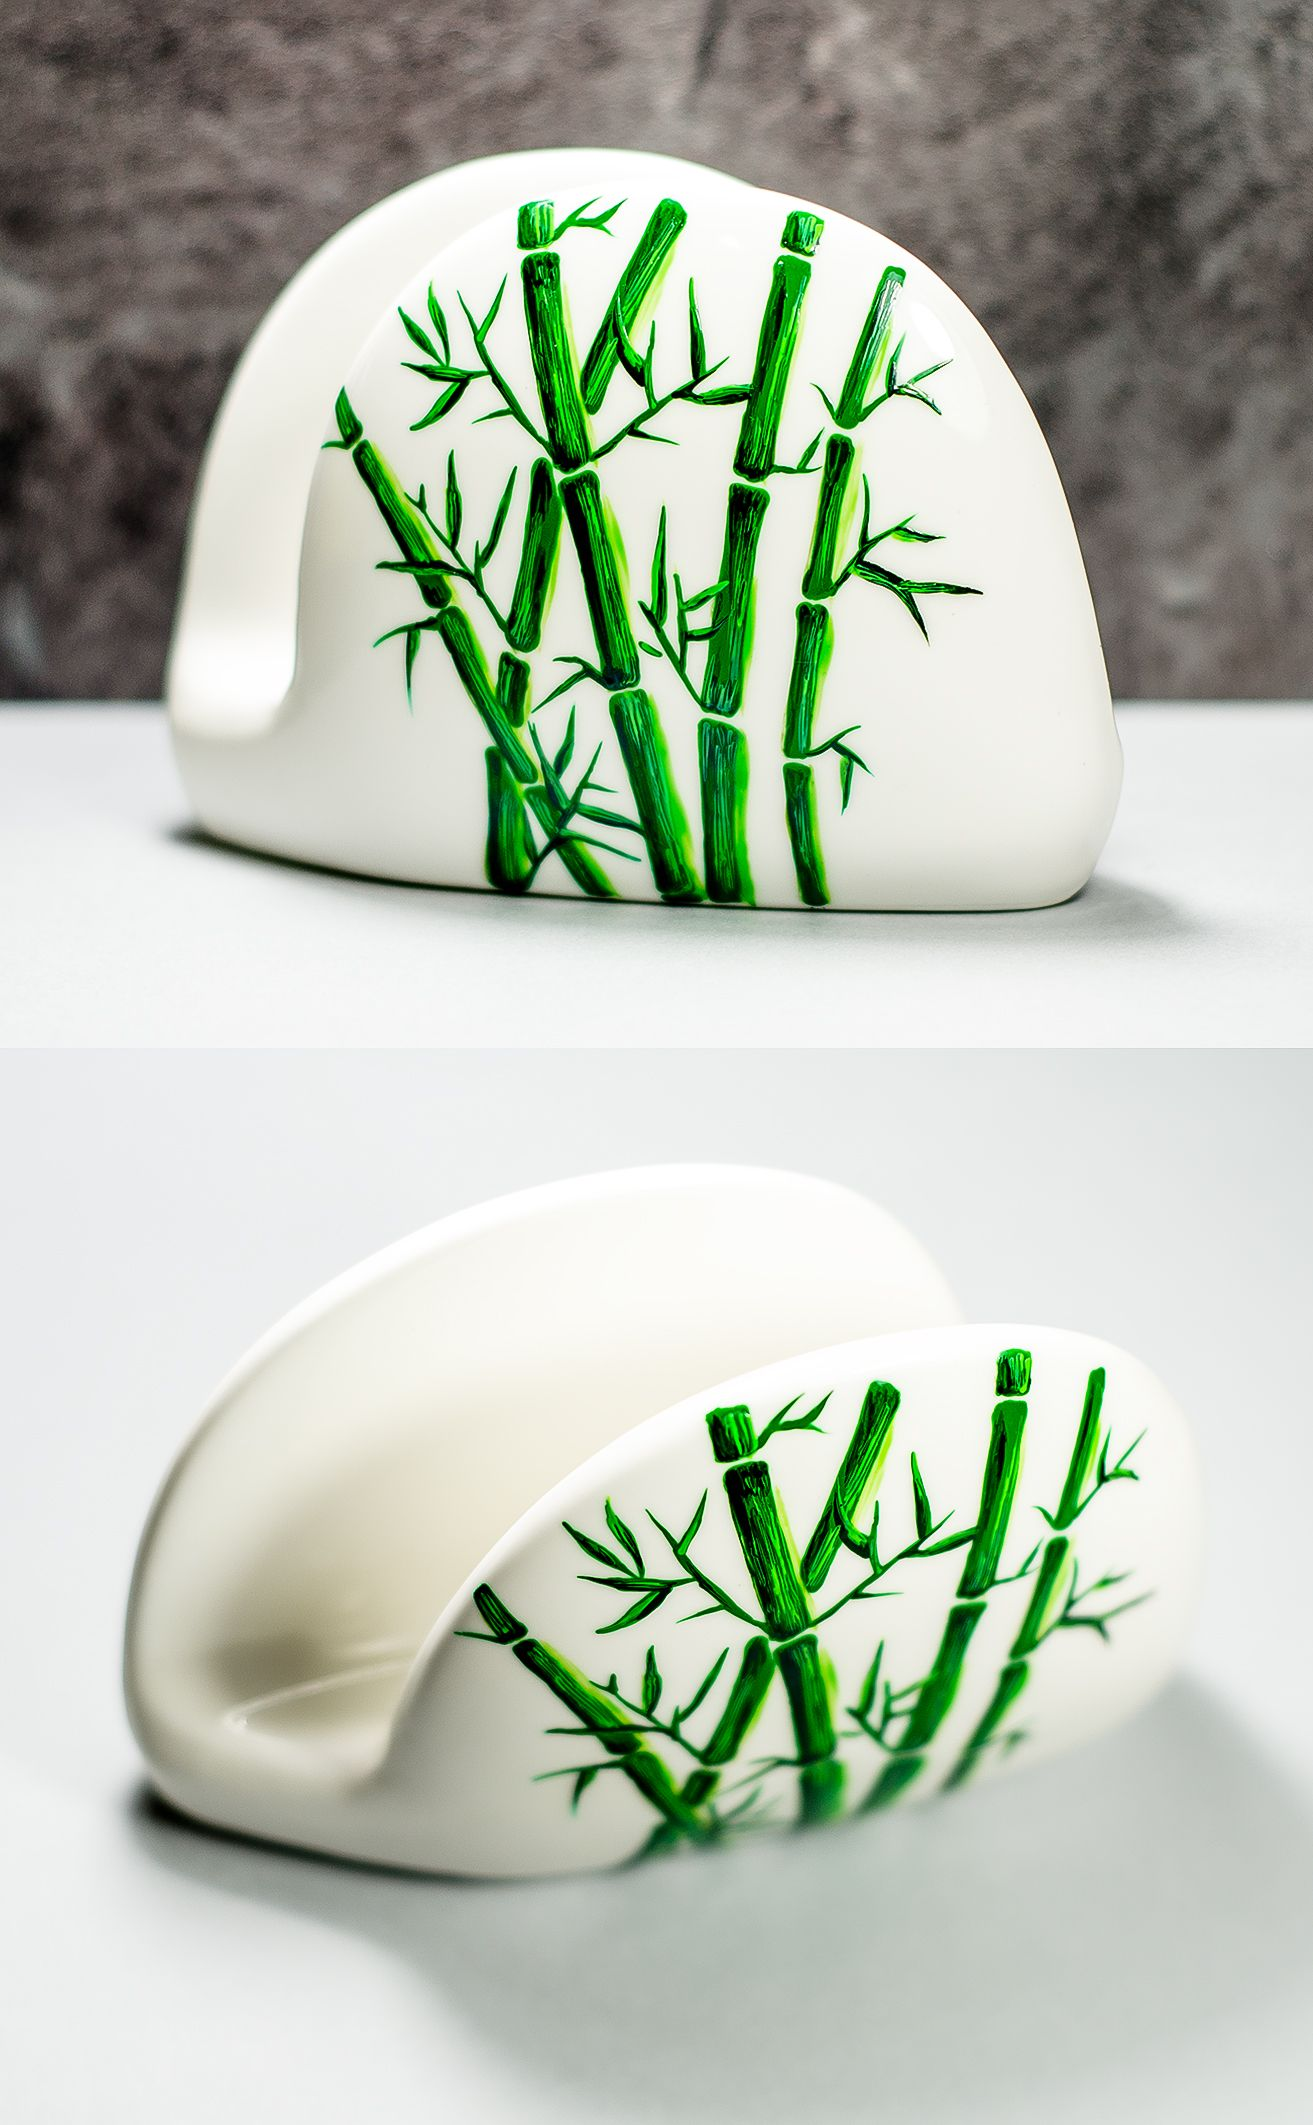 Ceramic napkin holder foodie gift ideas holiday hostess